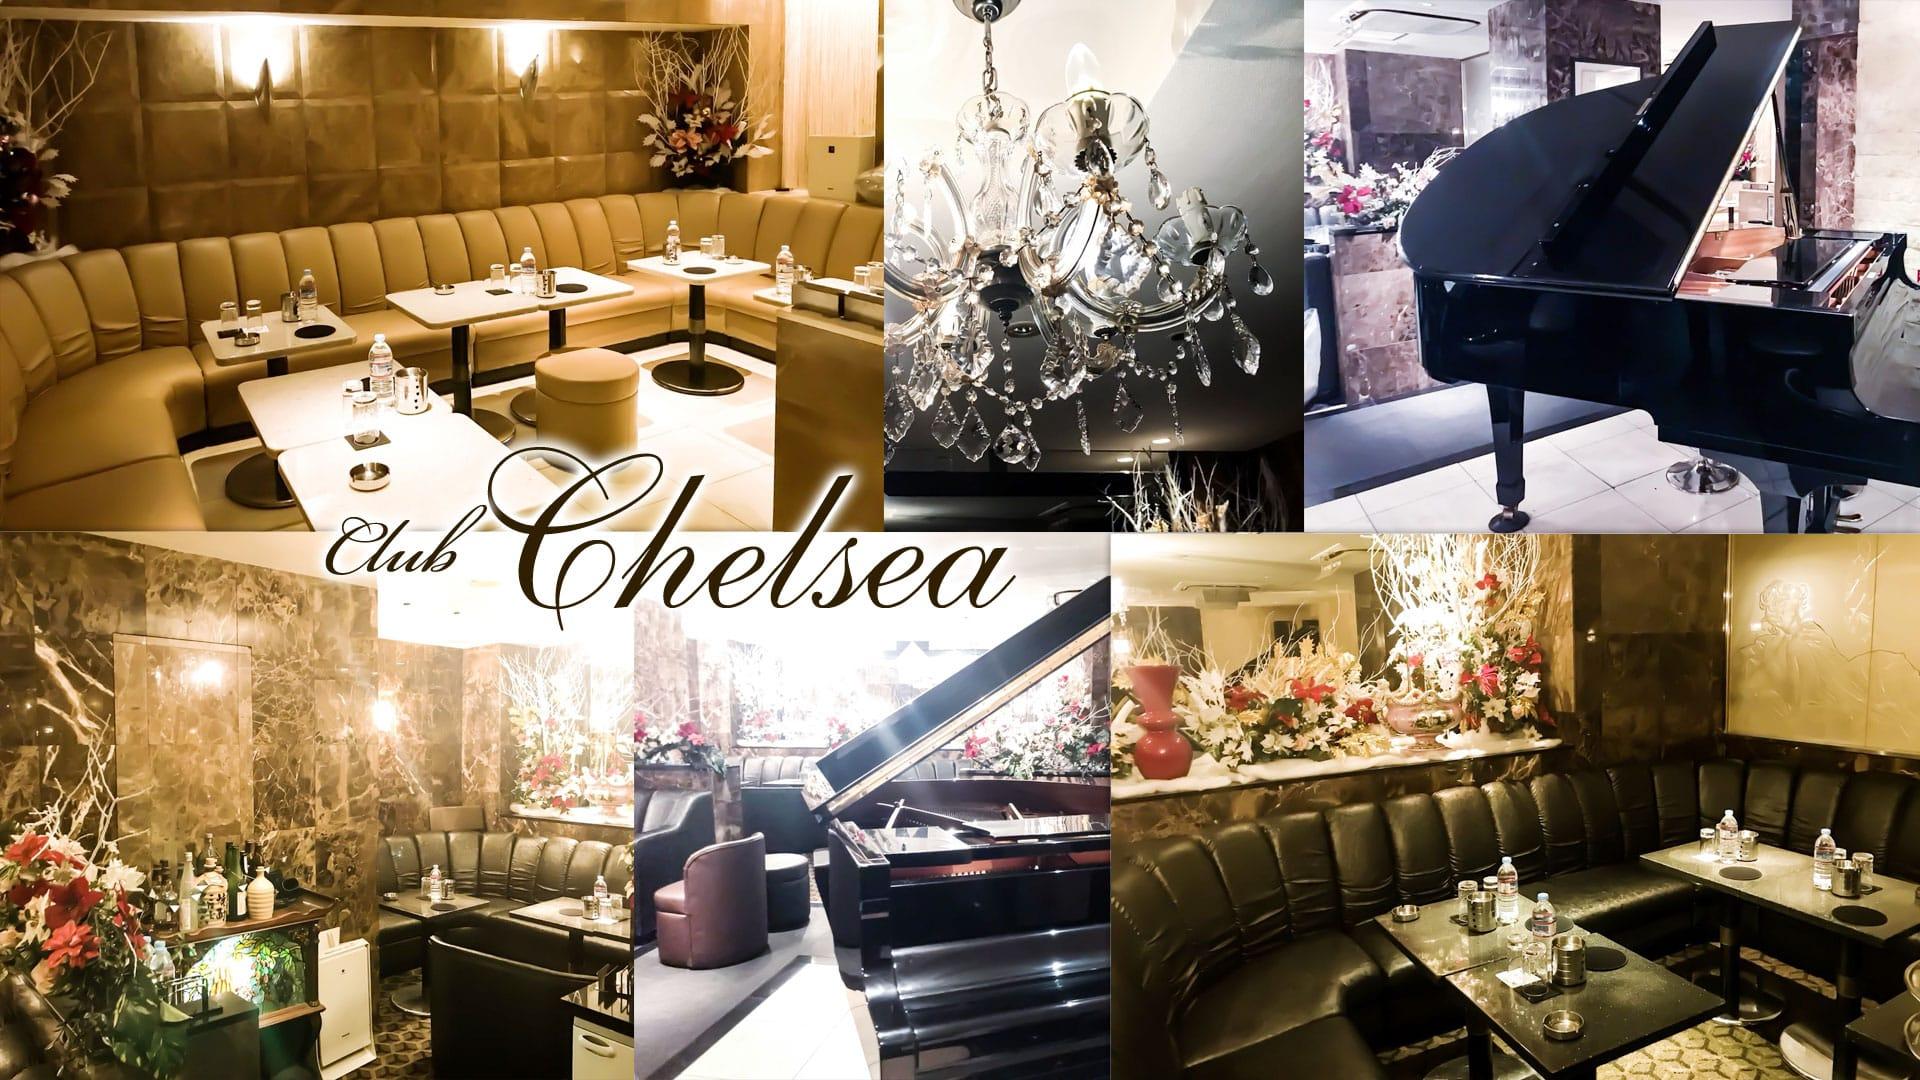 Club Chelsea(チェルシー) TOP画像